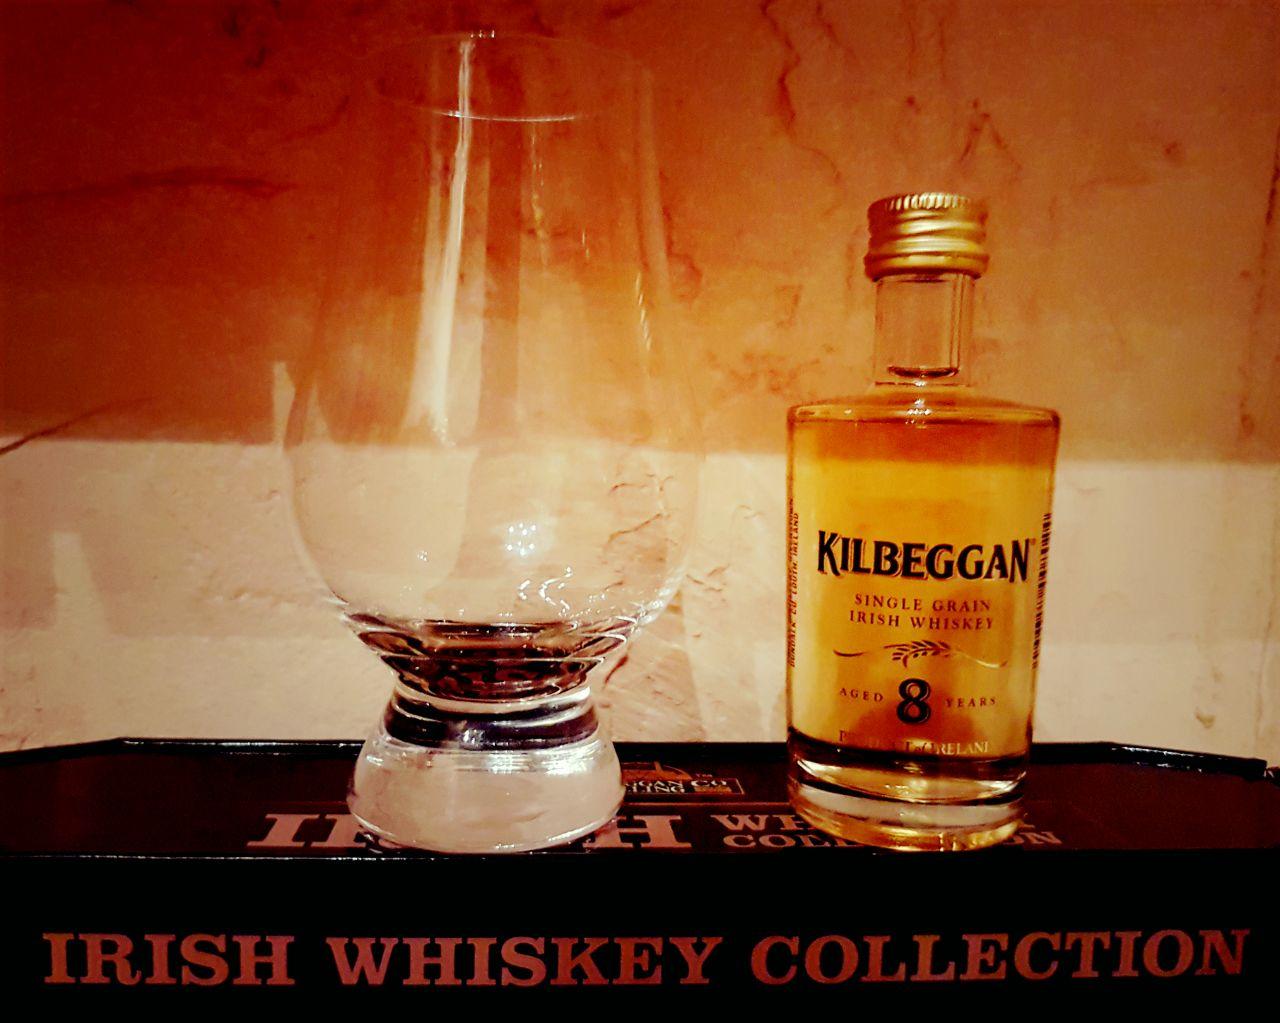 Kilbeggan 8 Jahre Single Grain Irish Whiskey